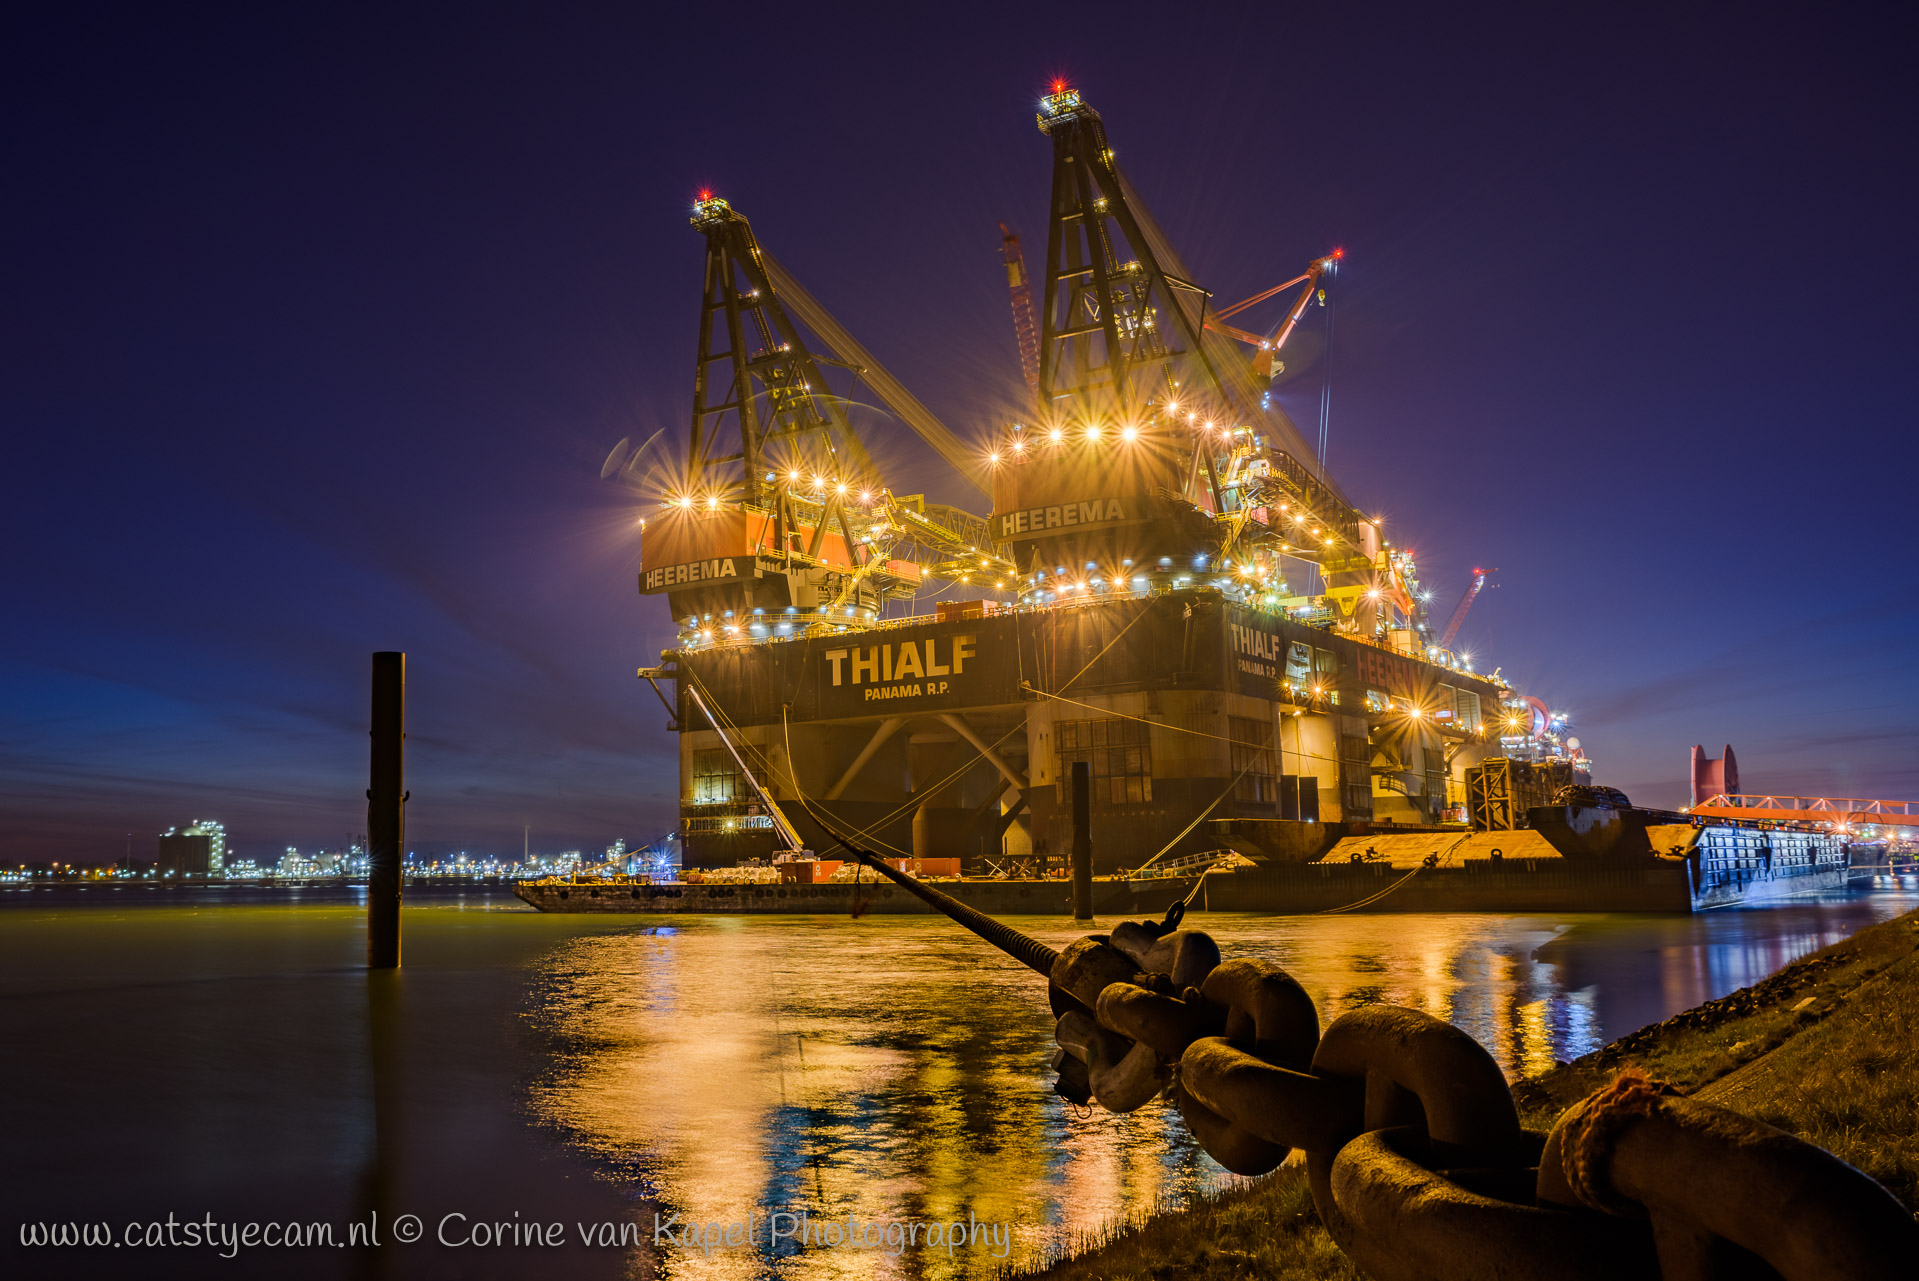 Crane vessel Thialf by night at the Calandkanaal